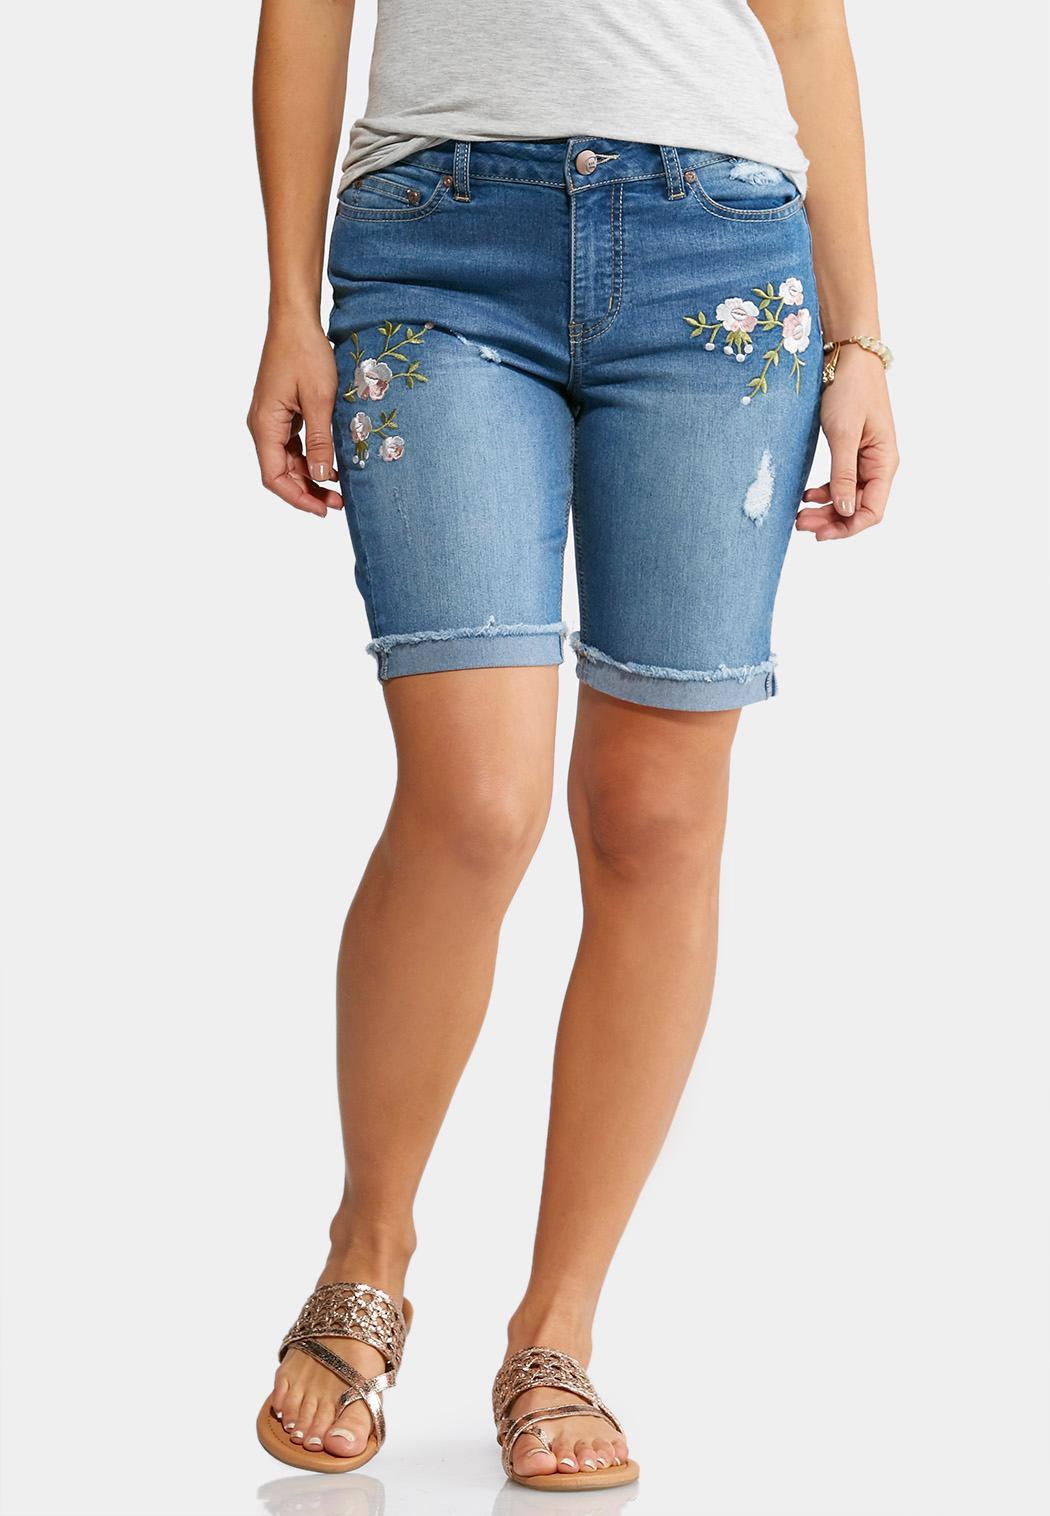 Bermuda Shorts embroidered denim bermuda shorts TWIGSMQ